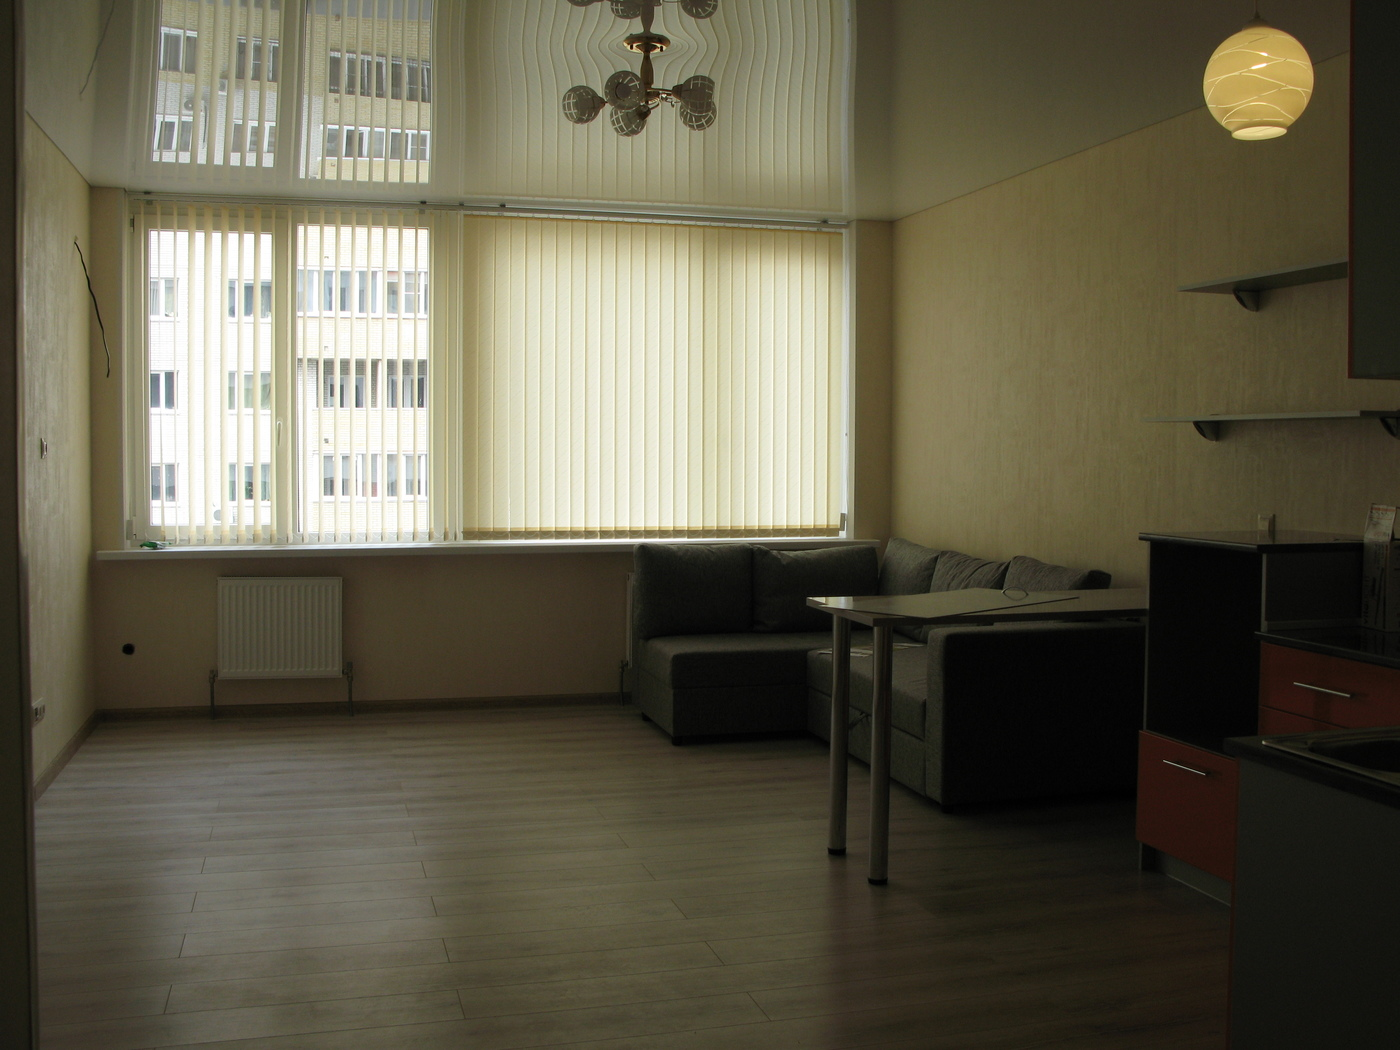 Ремонт квартиры. Укладка ламината